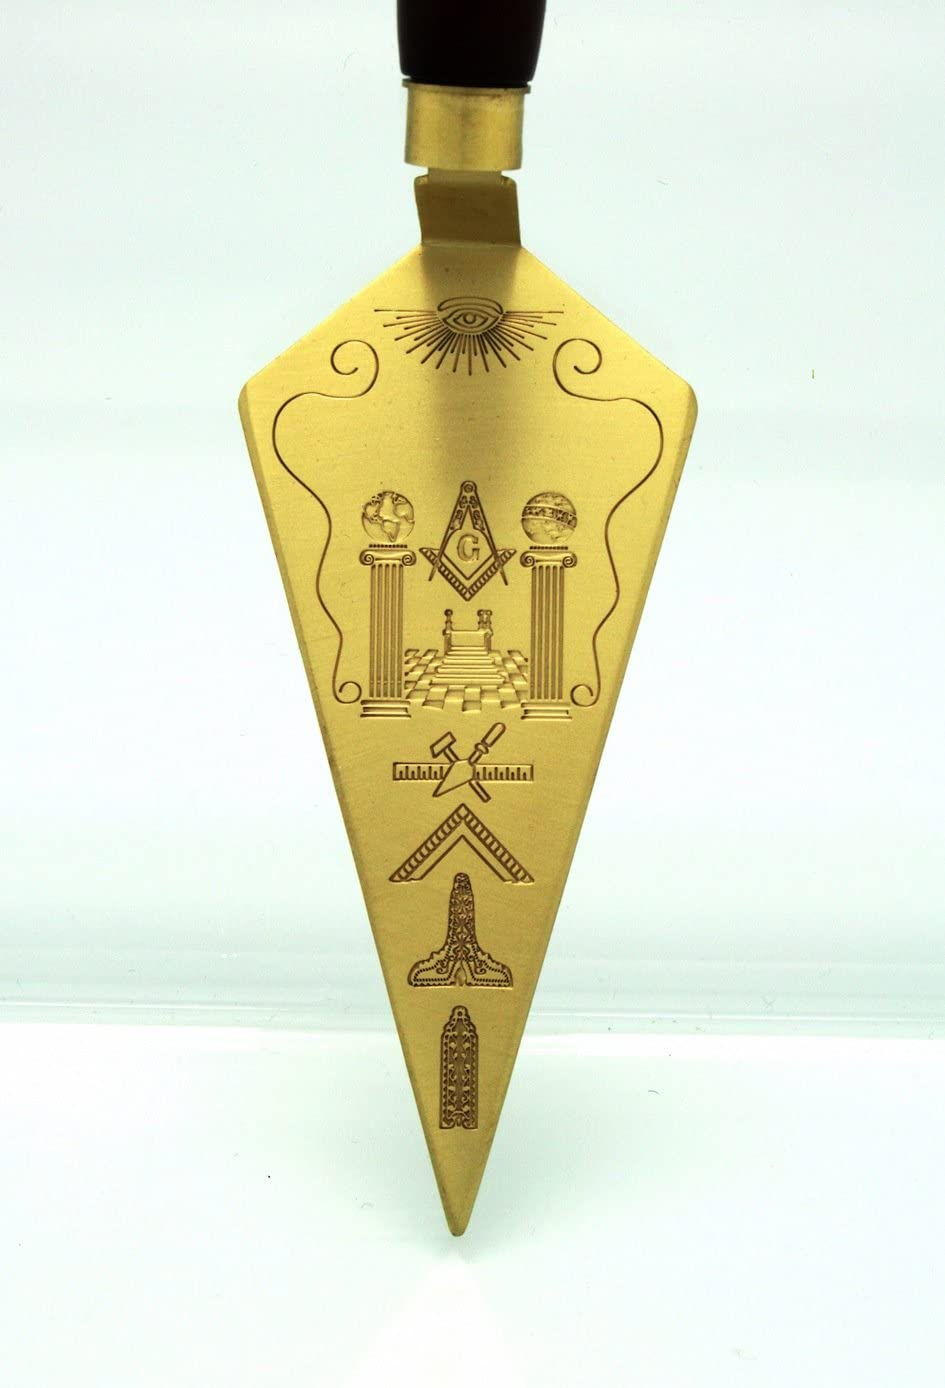 Masonic Trowel Master Mason Freemason Gift Metal Gold Plating Engraving T1